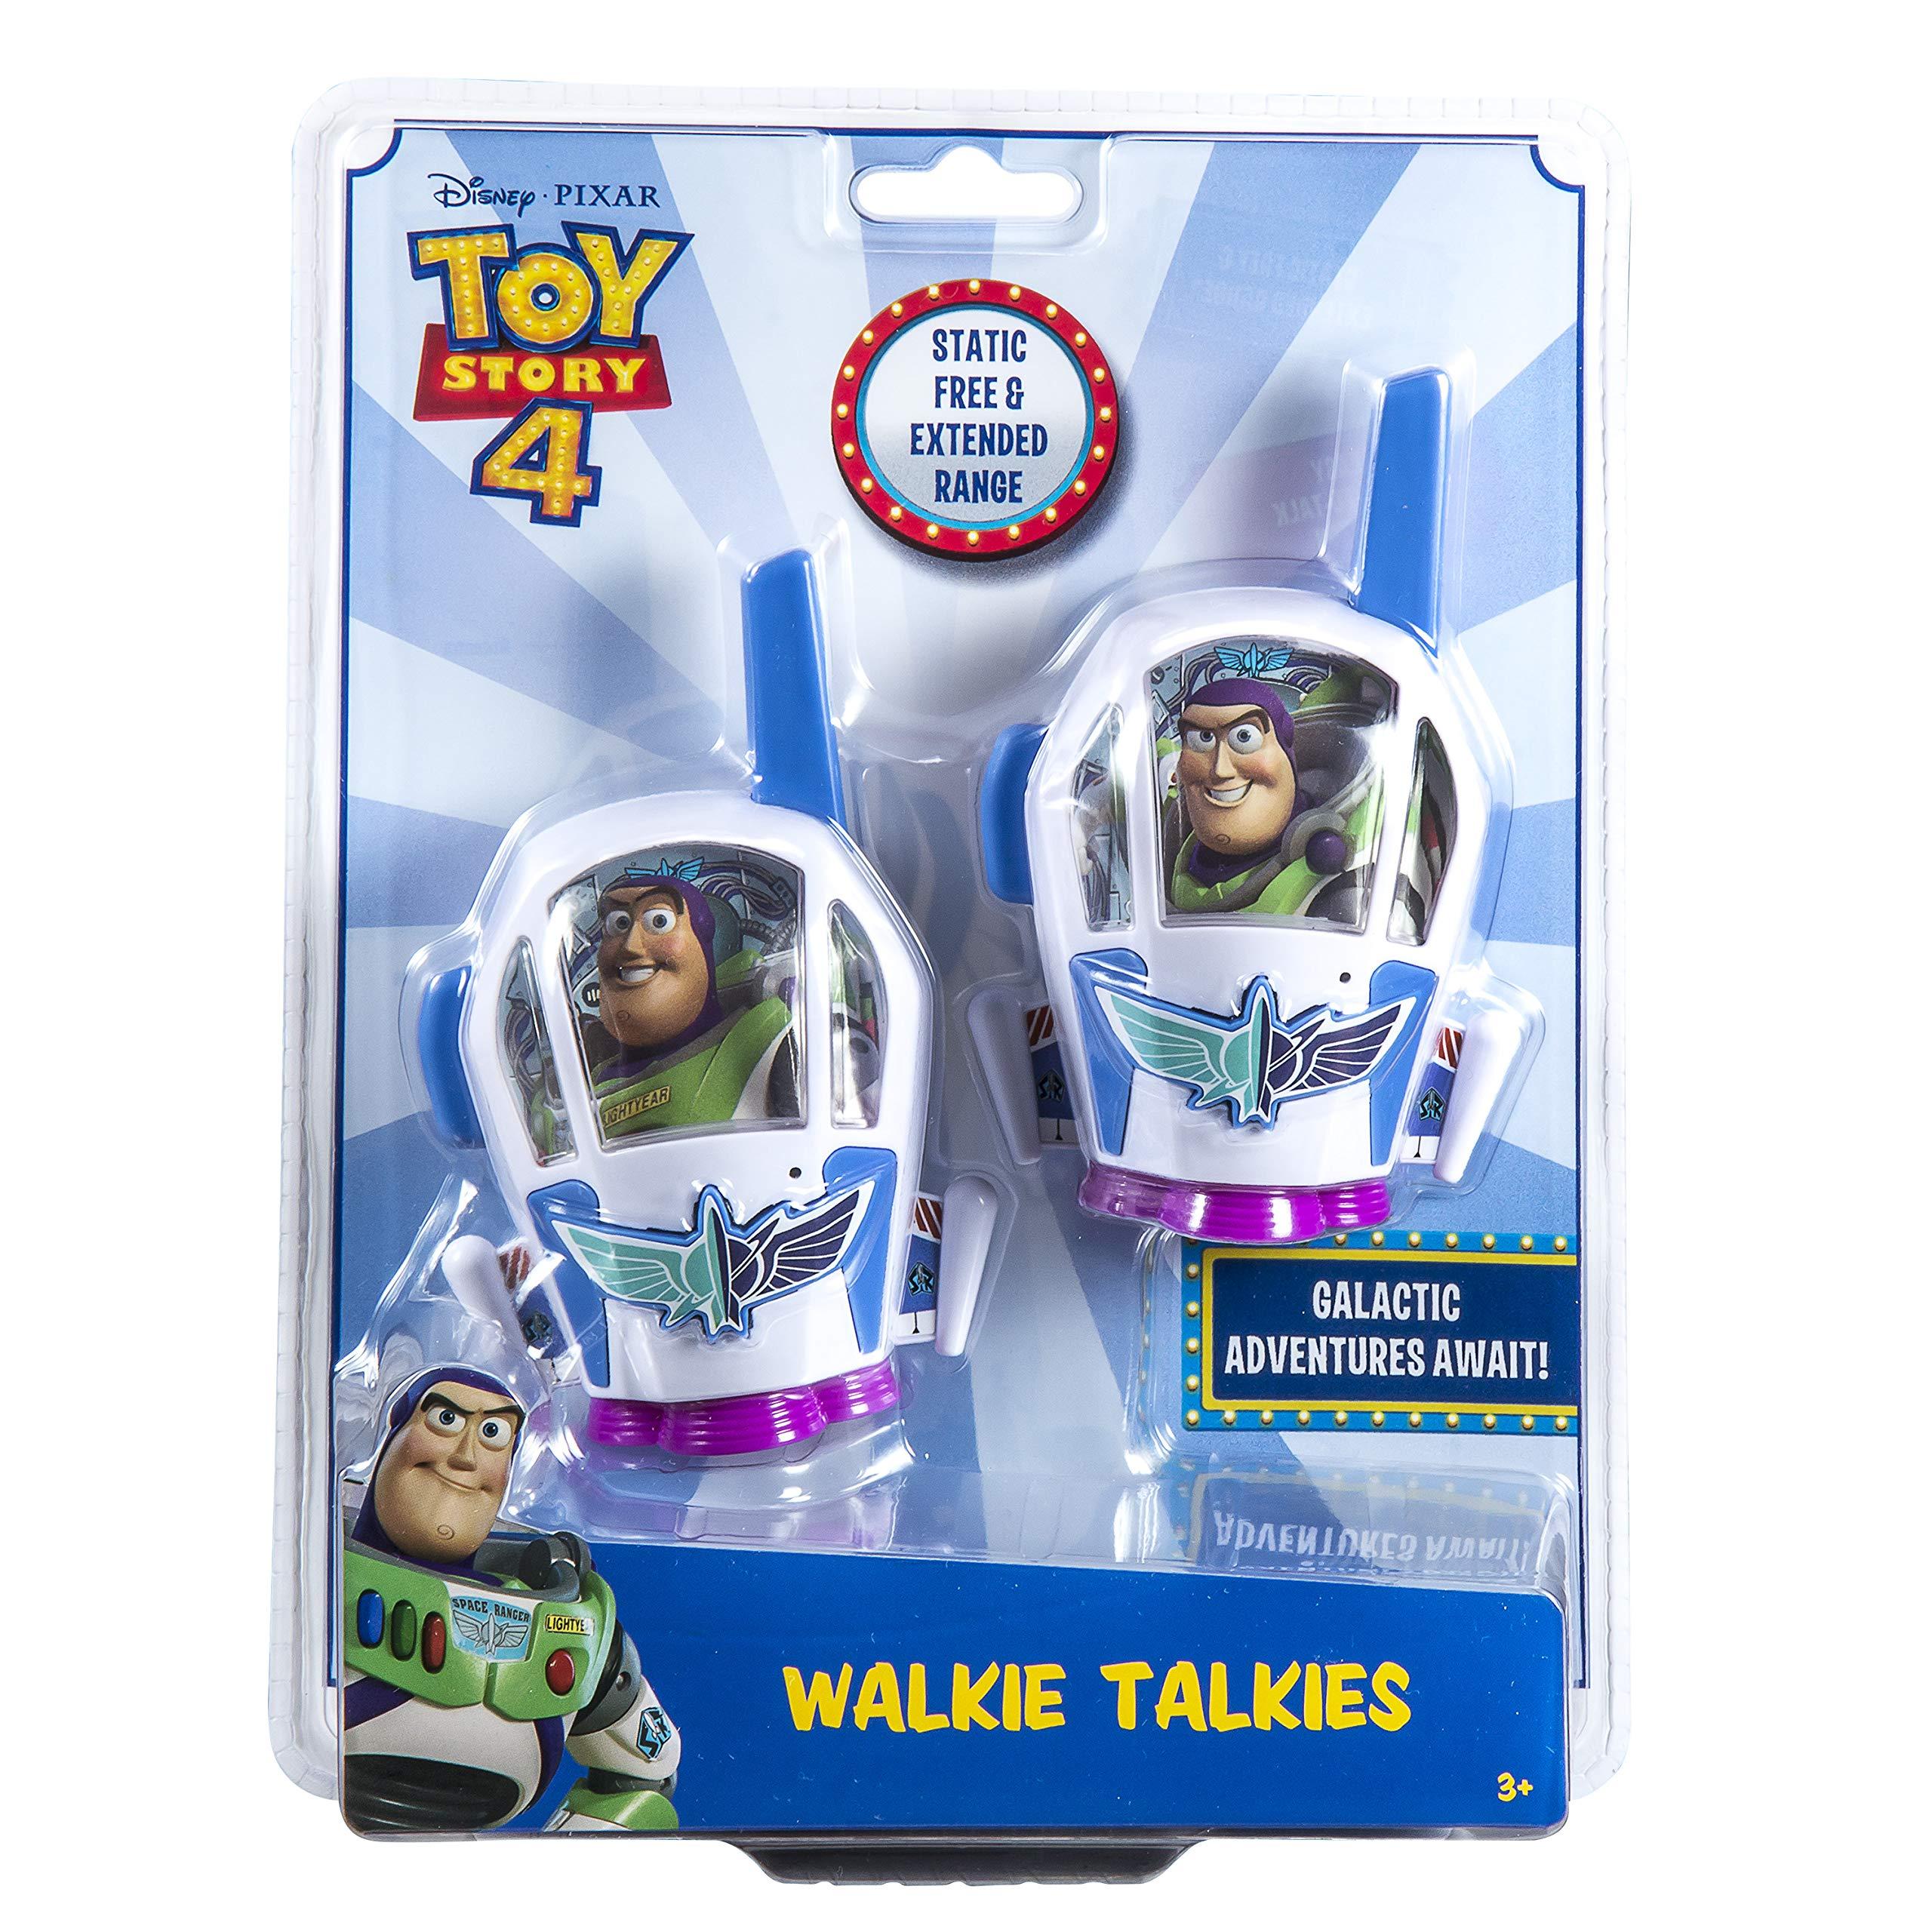 Toy Story 4 Buzz Lightyear Kids Walkie Talkies for Kids Static Free Extended Range Kid Friendly Easy to Use 2 Way Radio Toy Handheld Walkie Talkies Team Work Play Indoors or Outdoors by eKids (Image #4)